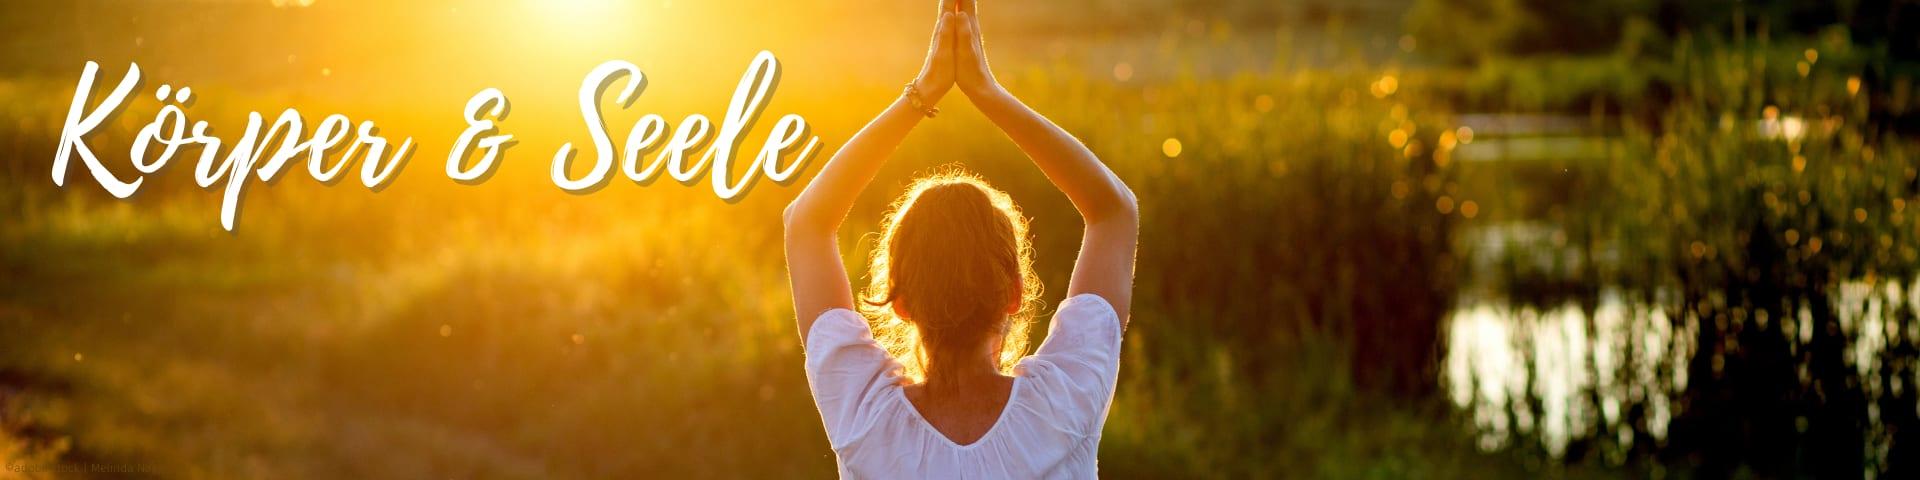 Rubrik Körper und Seele, Meditation